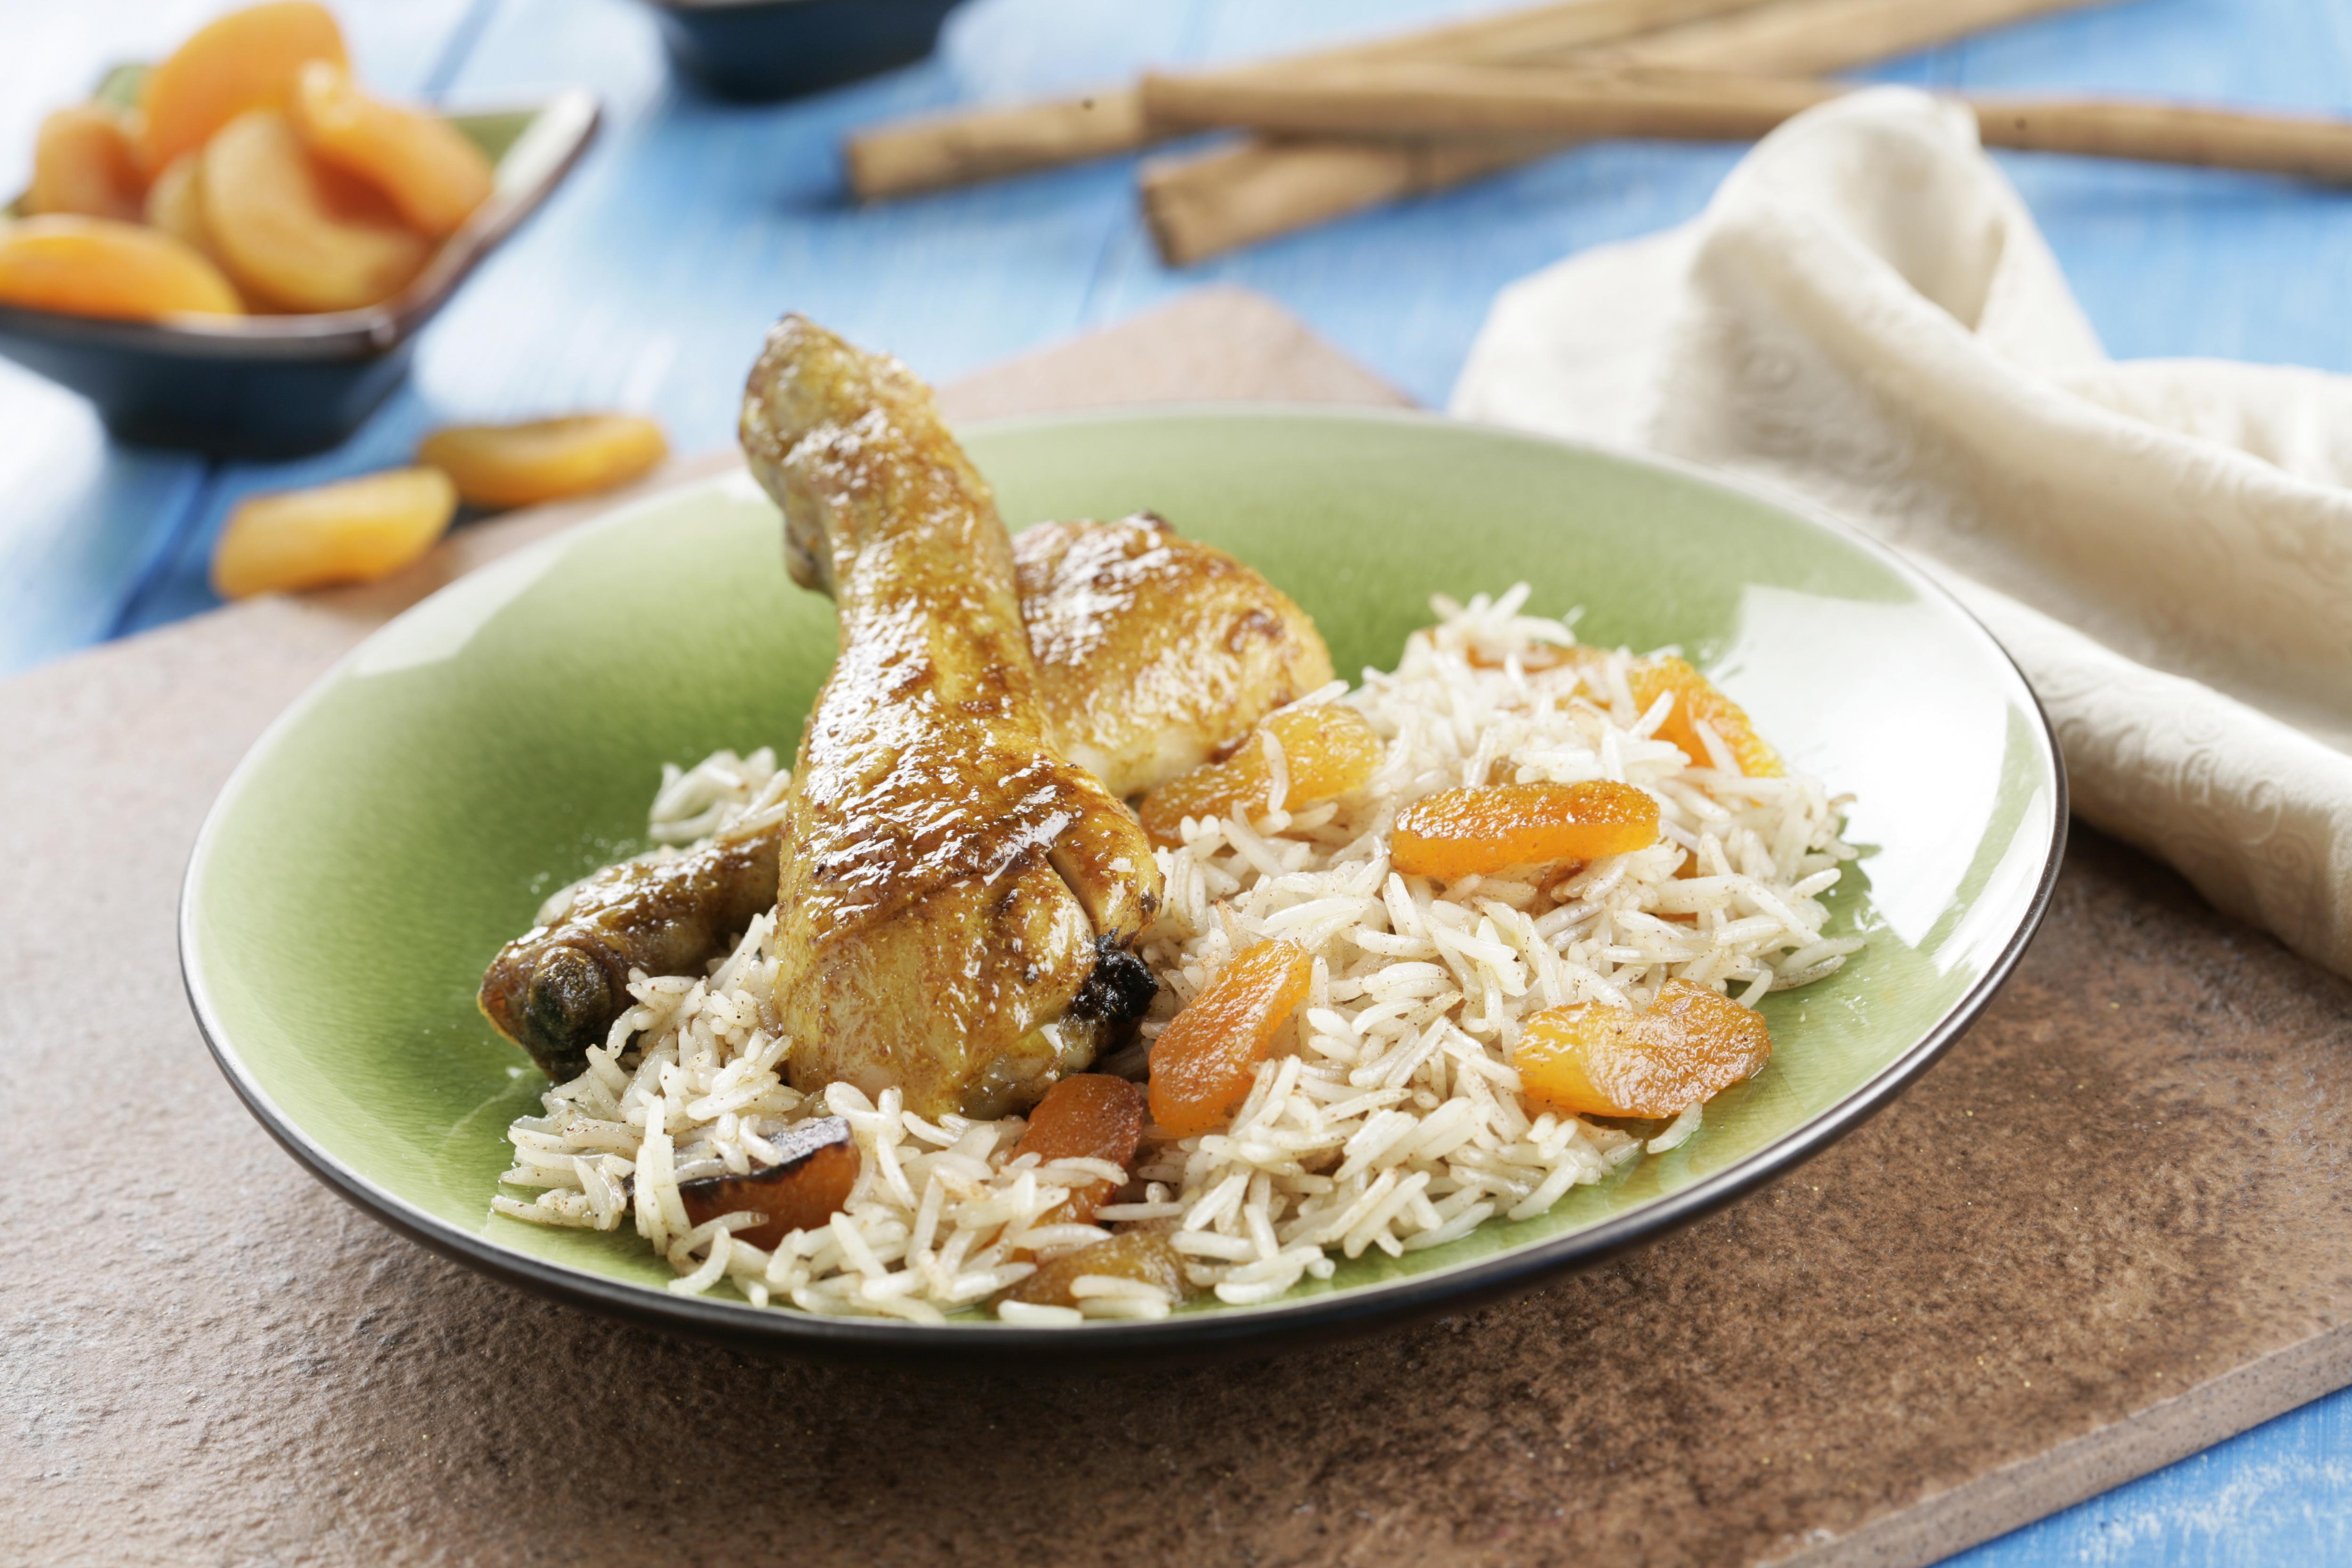 Receta de Pollo al curry de madras – Receta Arroz Basmati – Sundari